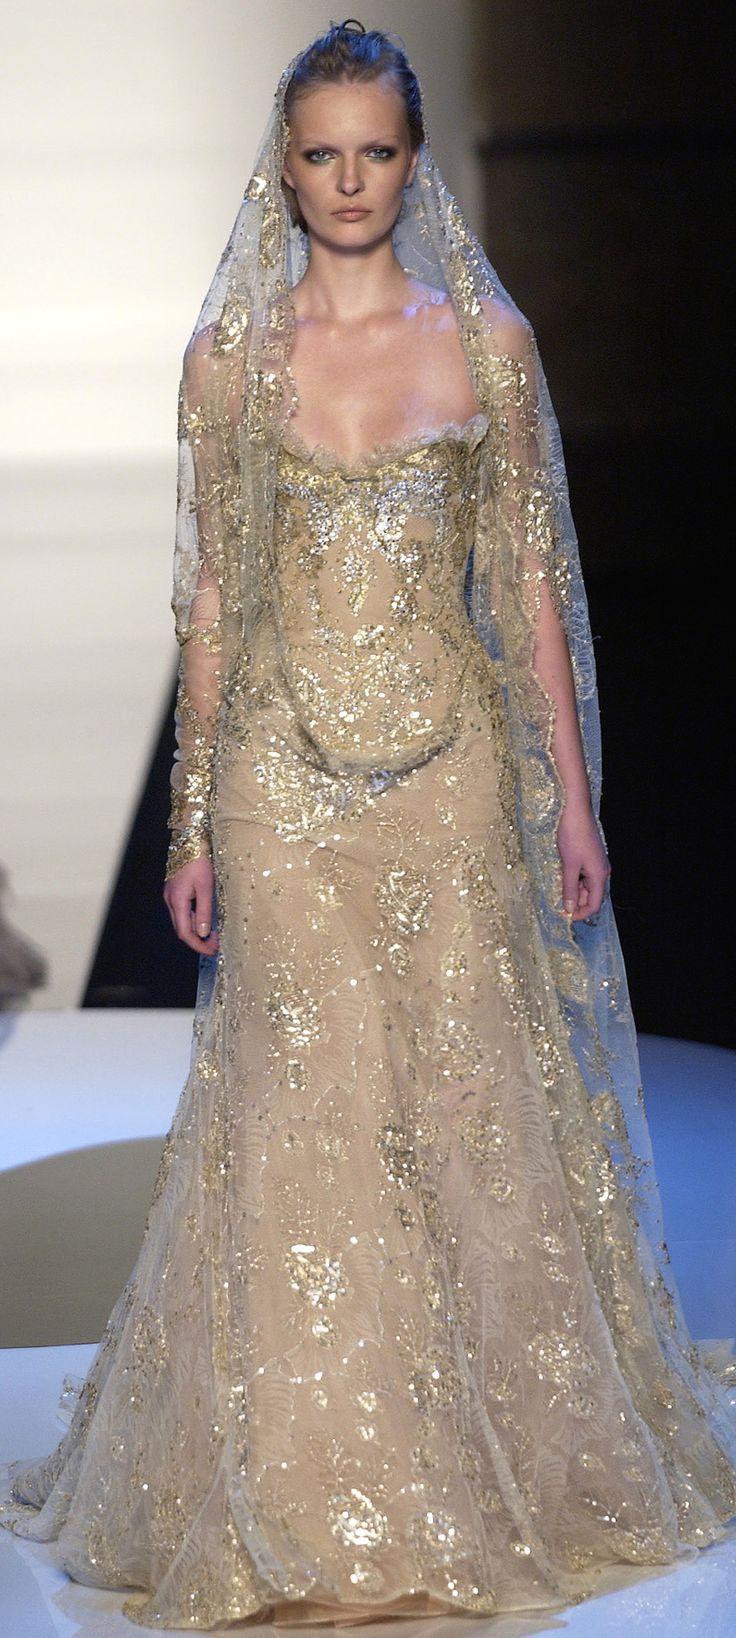 19 best Gold wedding dress images on Pinterest | Wedding frocks ...